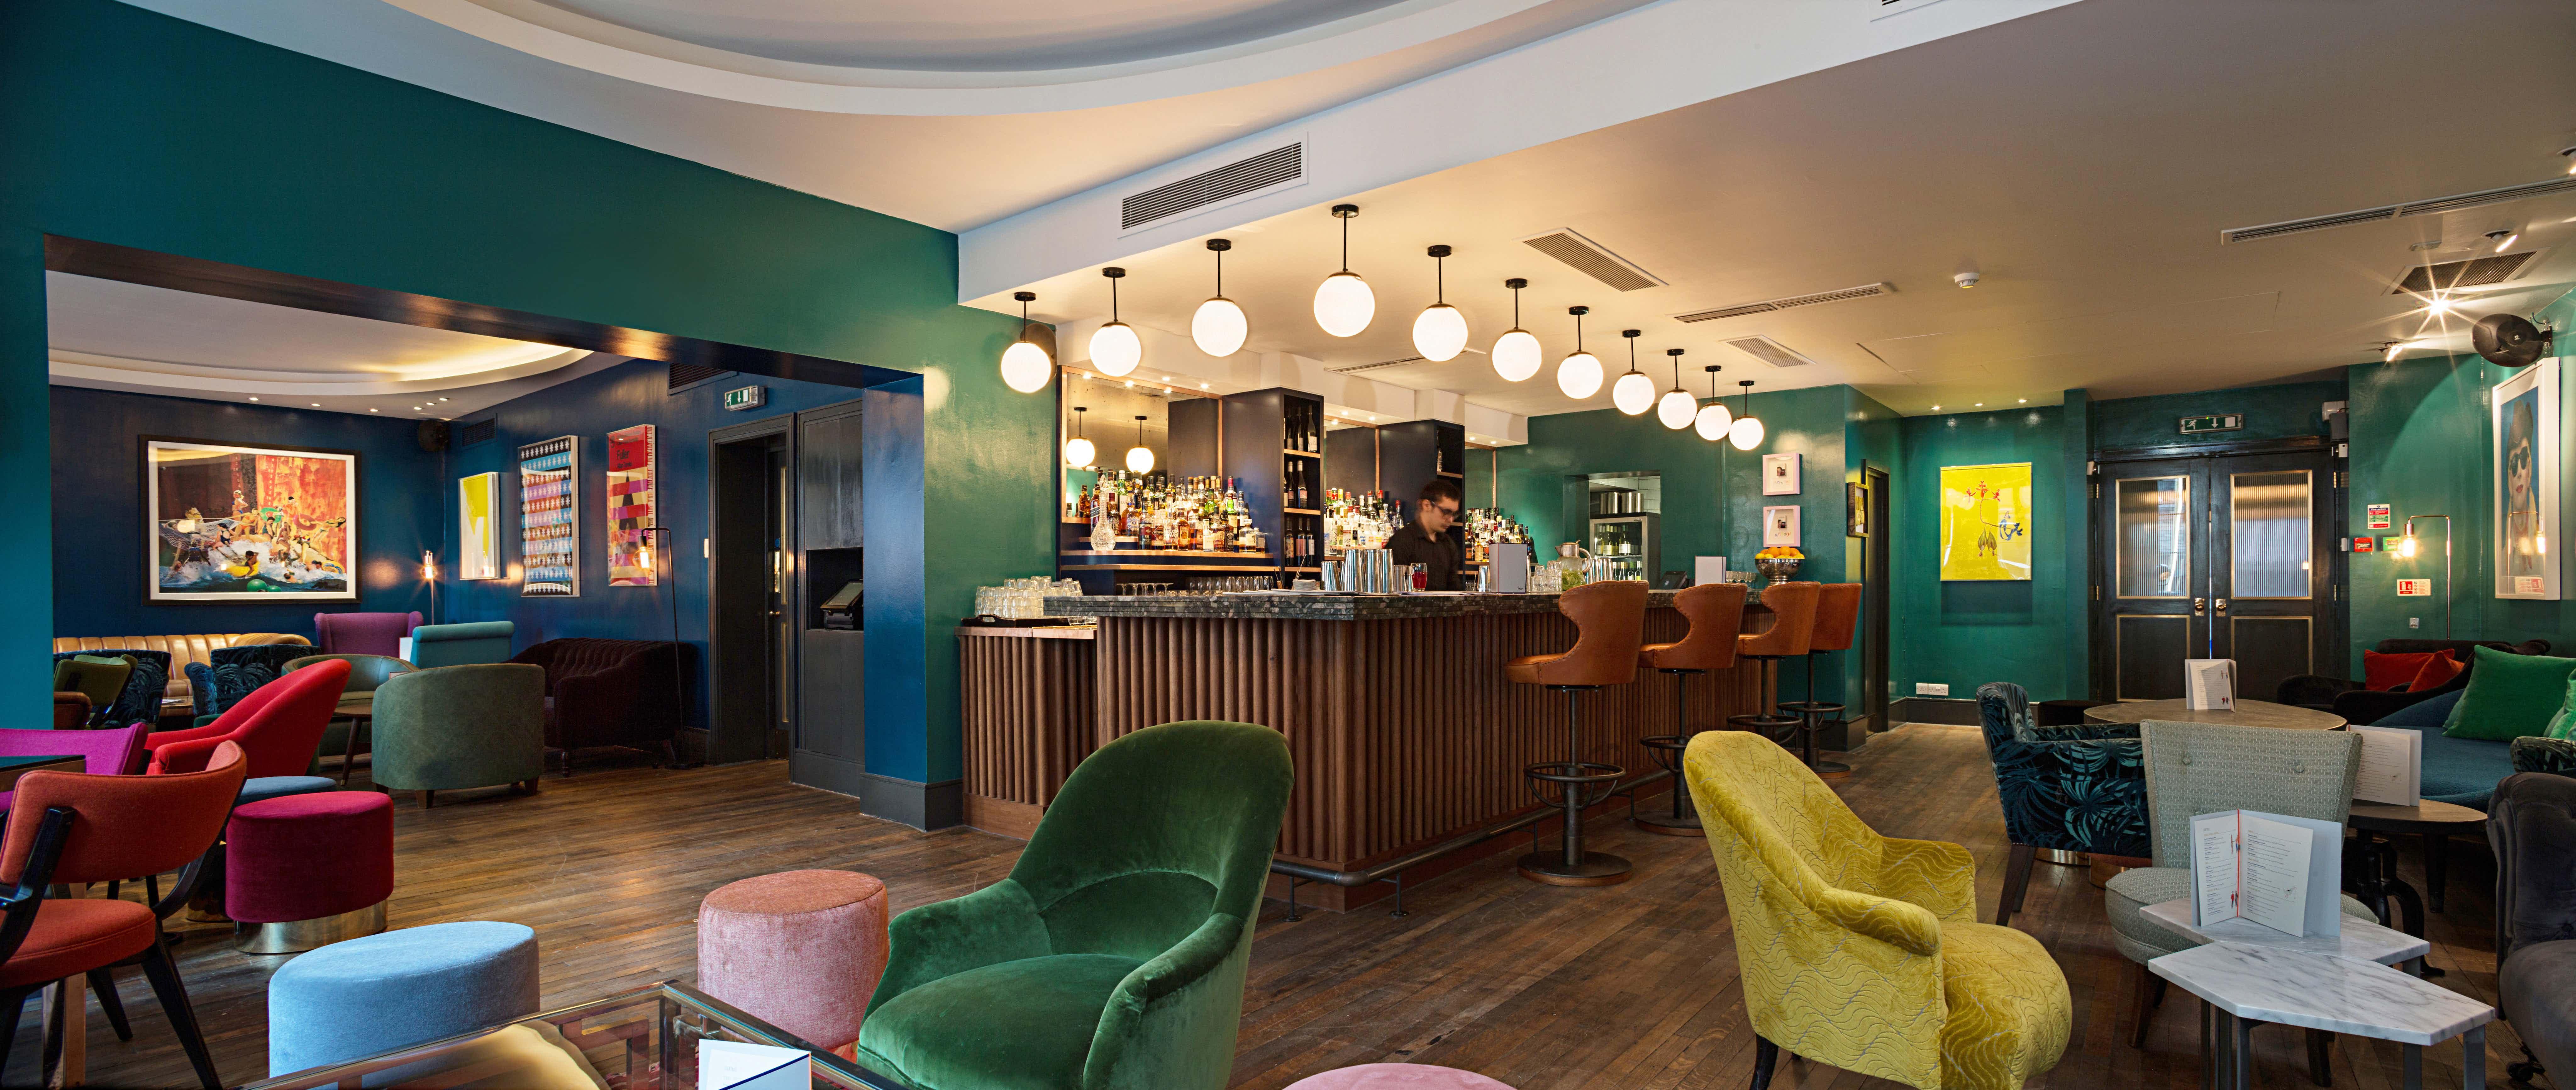 Soho Bar, The Groucho Club